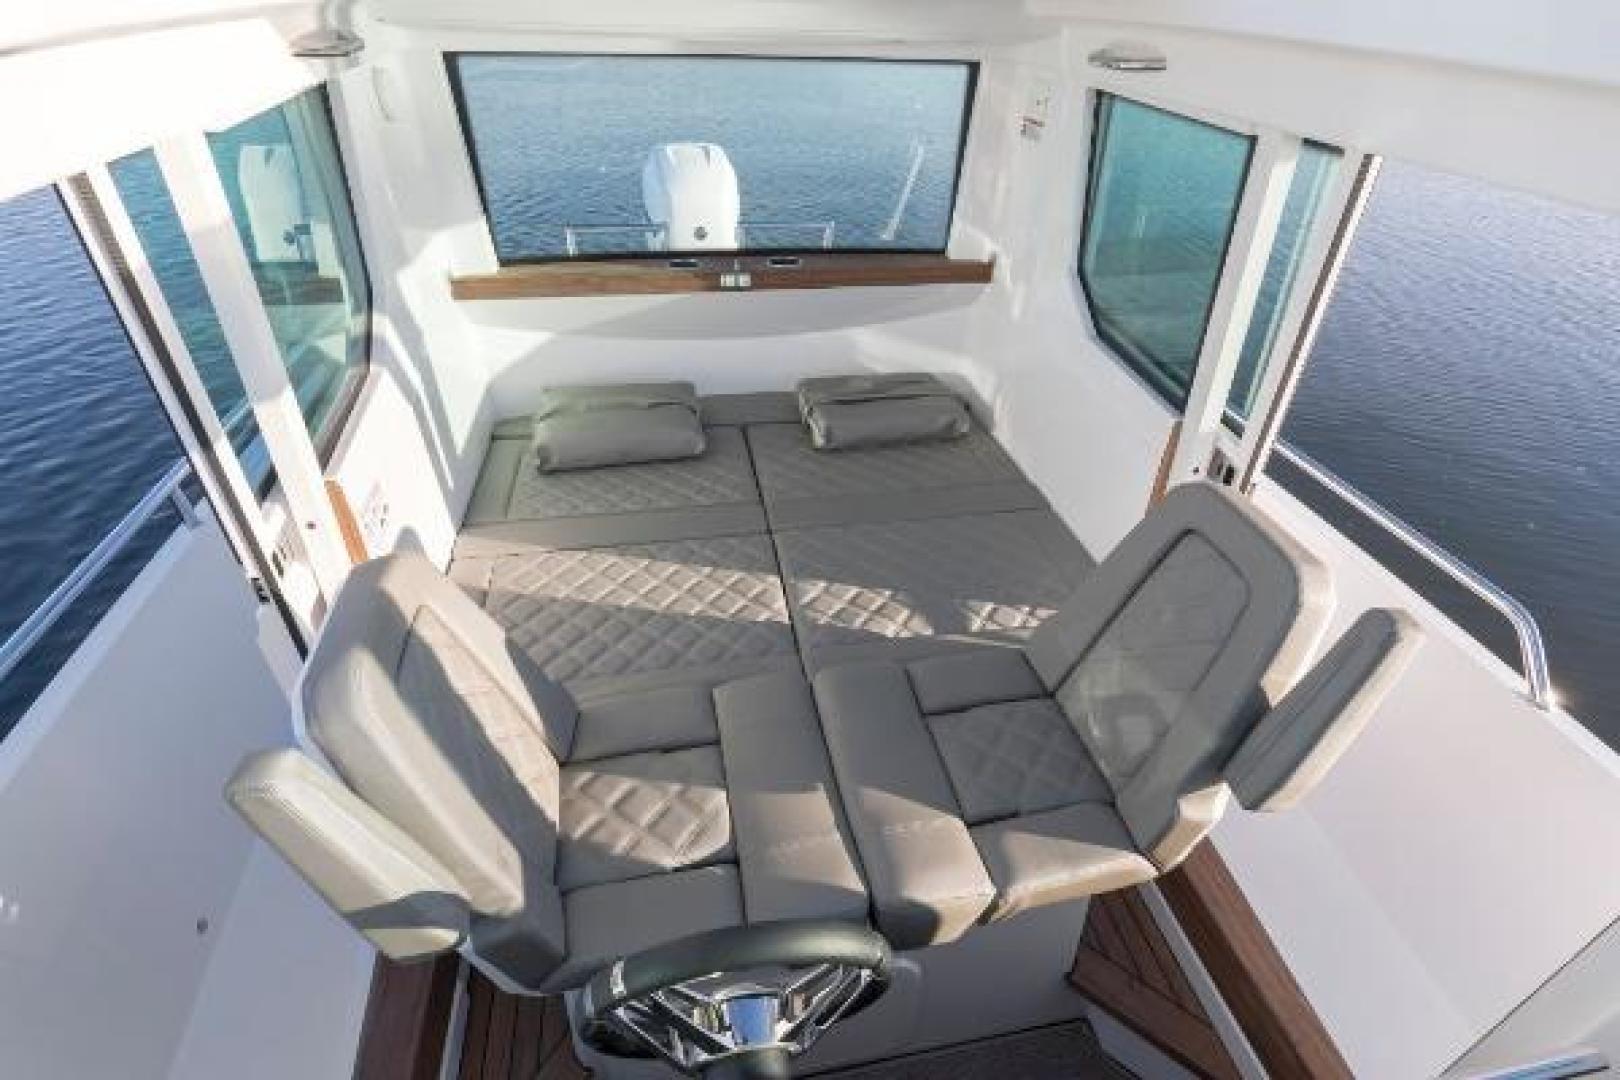 Axopar-28 CABIN 2021-Axopar 28 CABIN Sarasota-Florida-United States-1531540 | Thumbnail